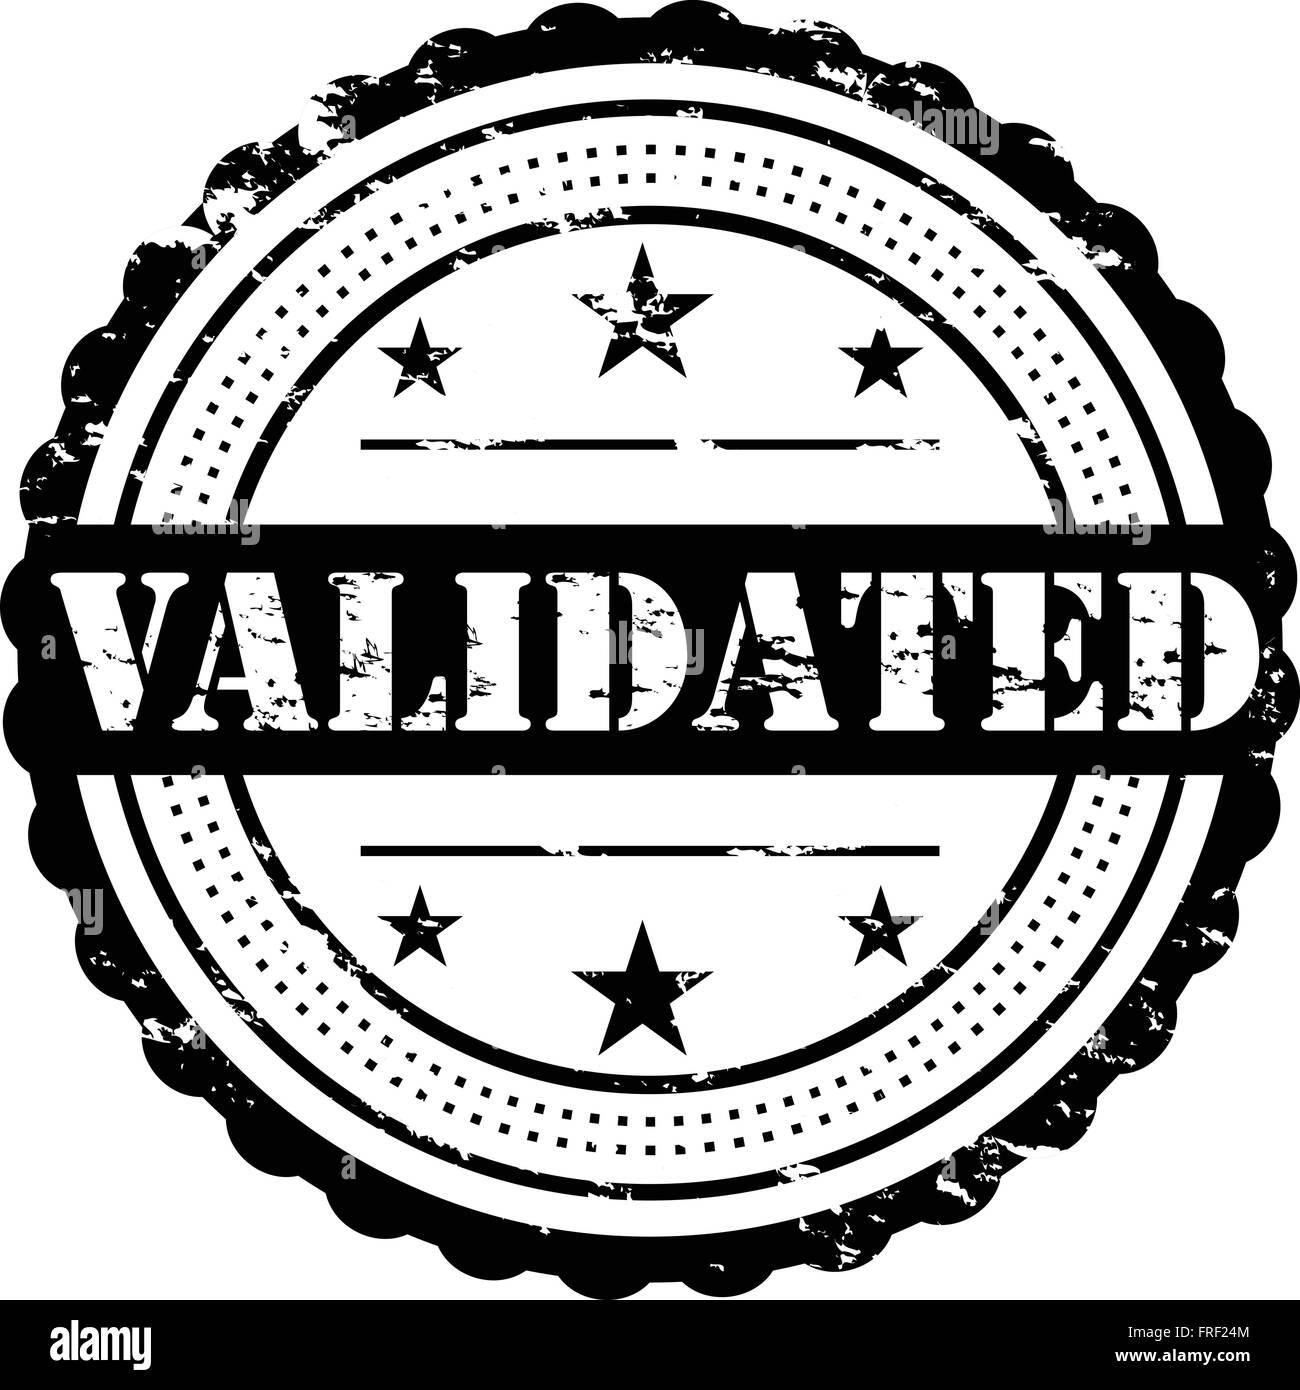 Validated Grunge Stamp Symbol